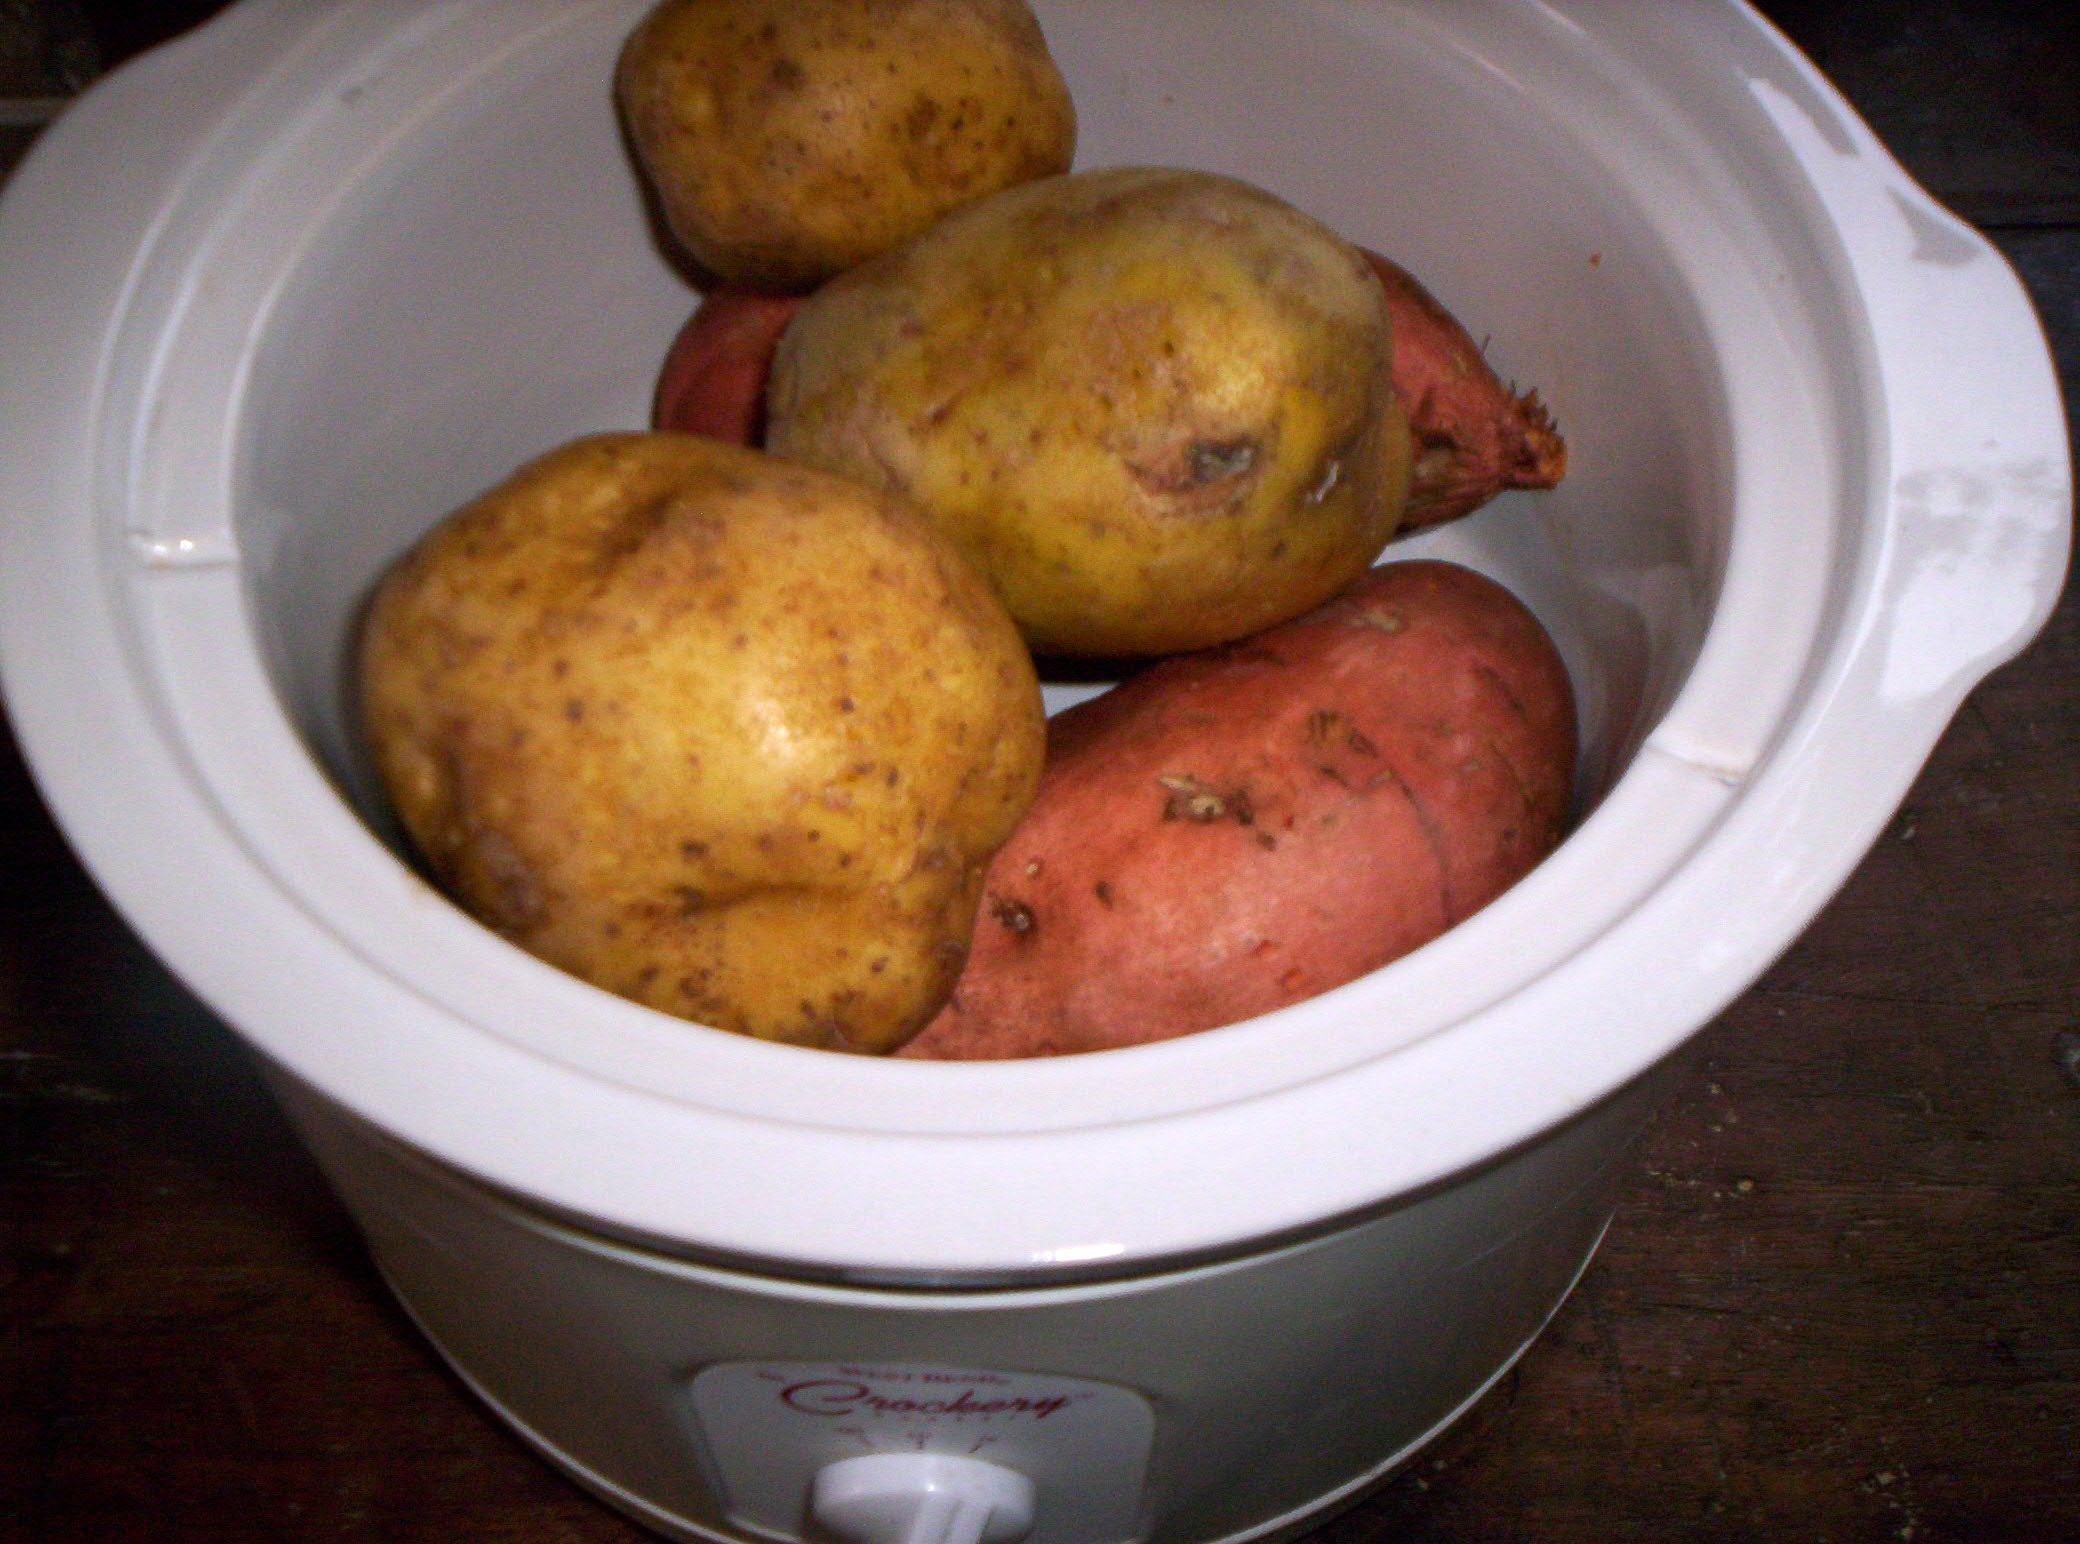 Baked Potatoes in Crockpot